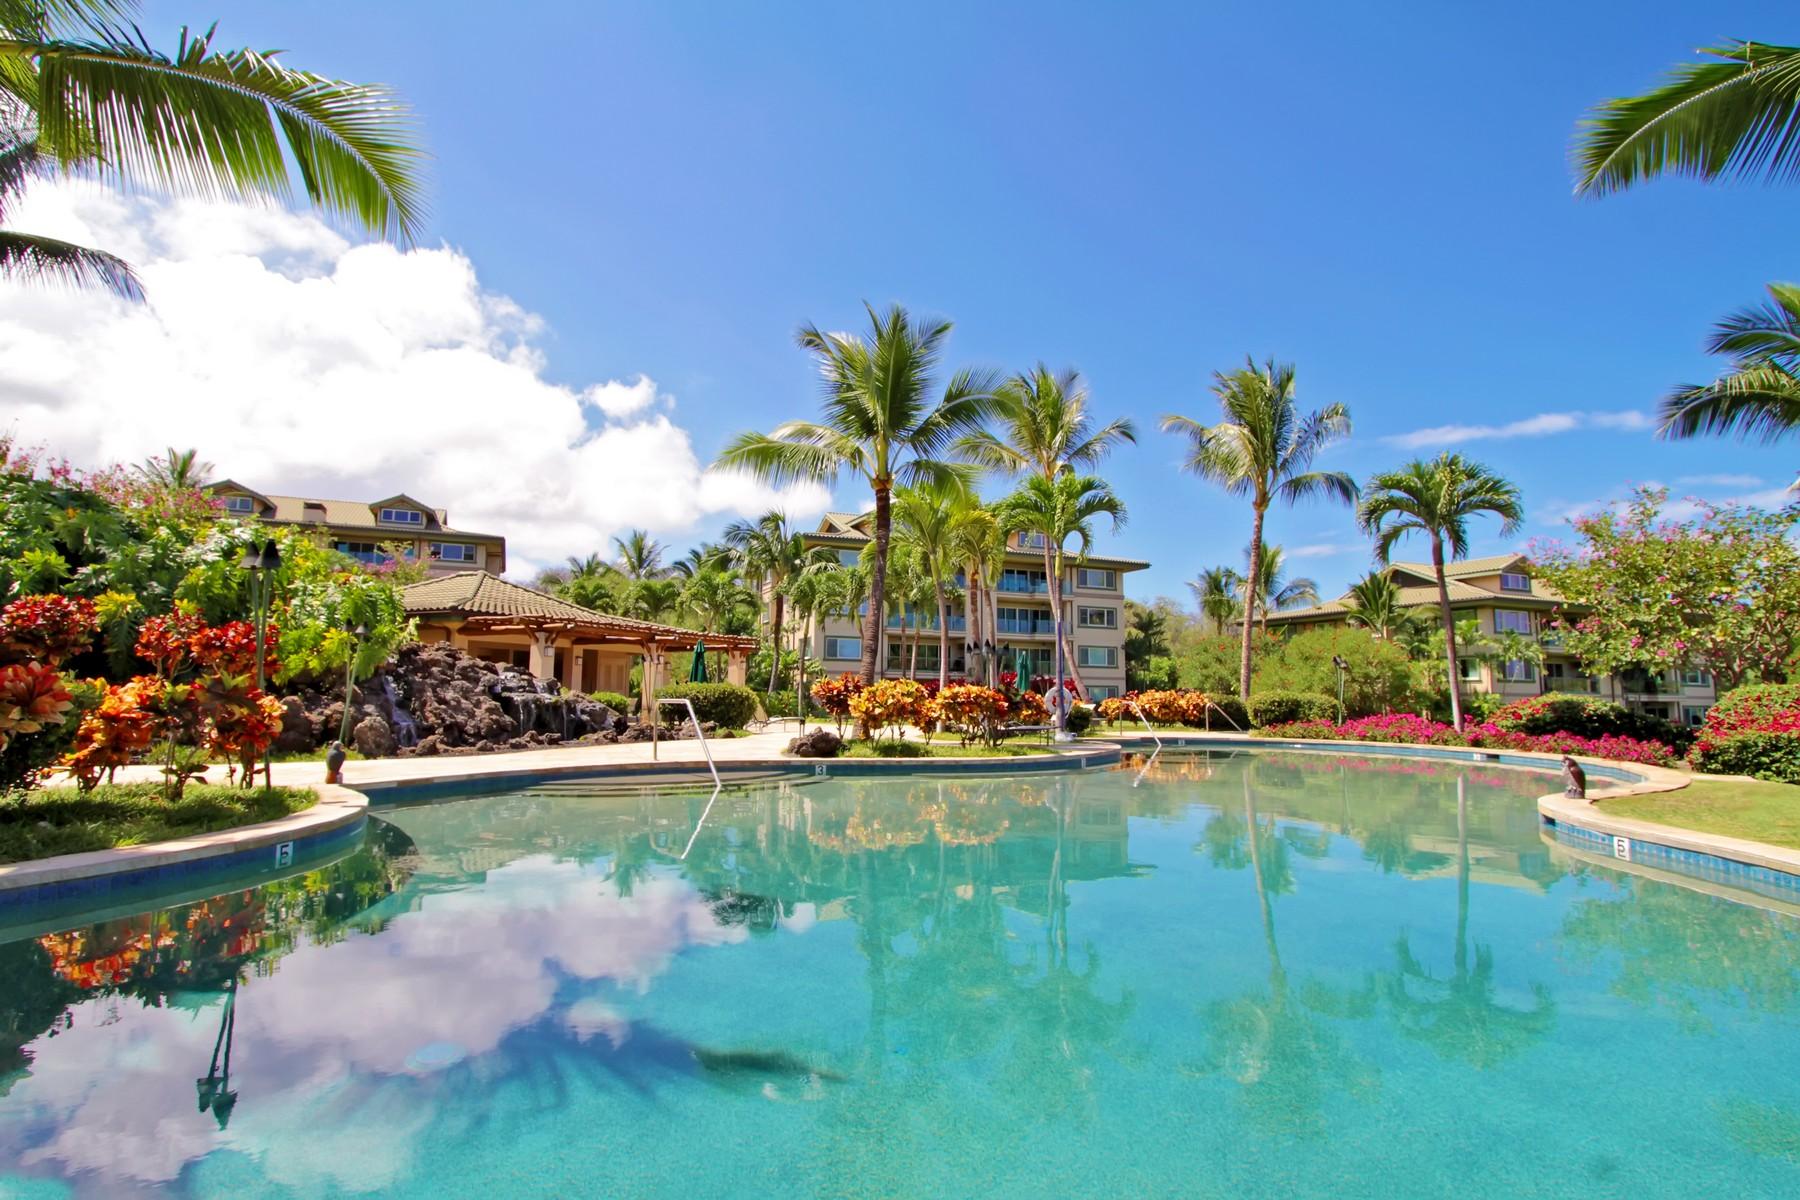 Condominio per Vendita alle ore Luxury Makena Maui Residential Condominium 4955 Makena Road, Na Hale O Makena D-201 Makena, Hawaii, 96753 Stati Uniti